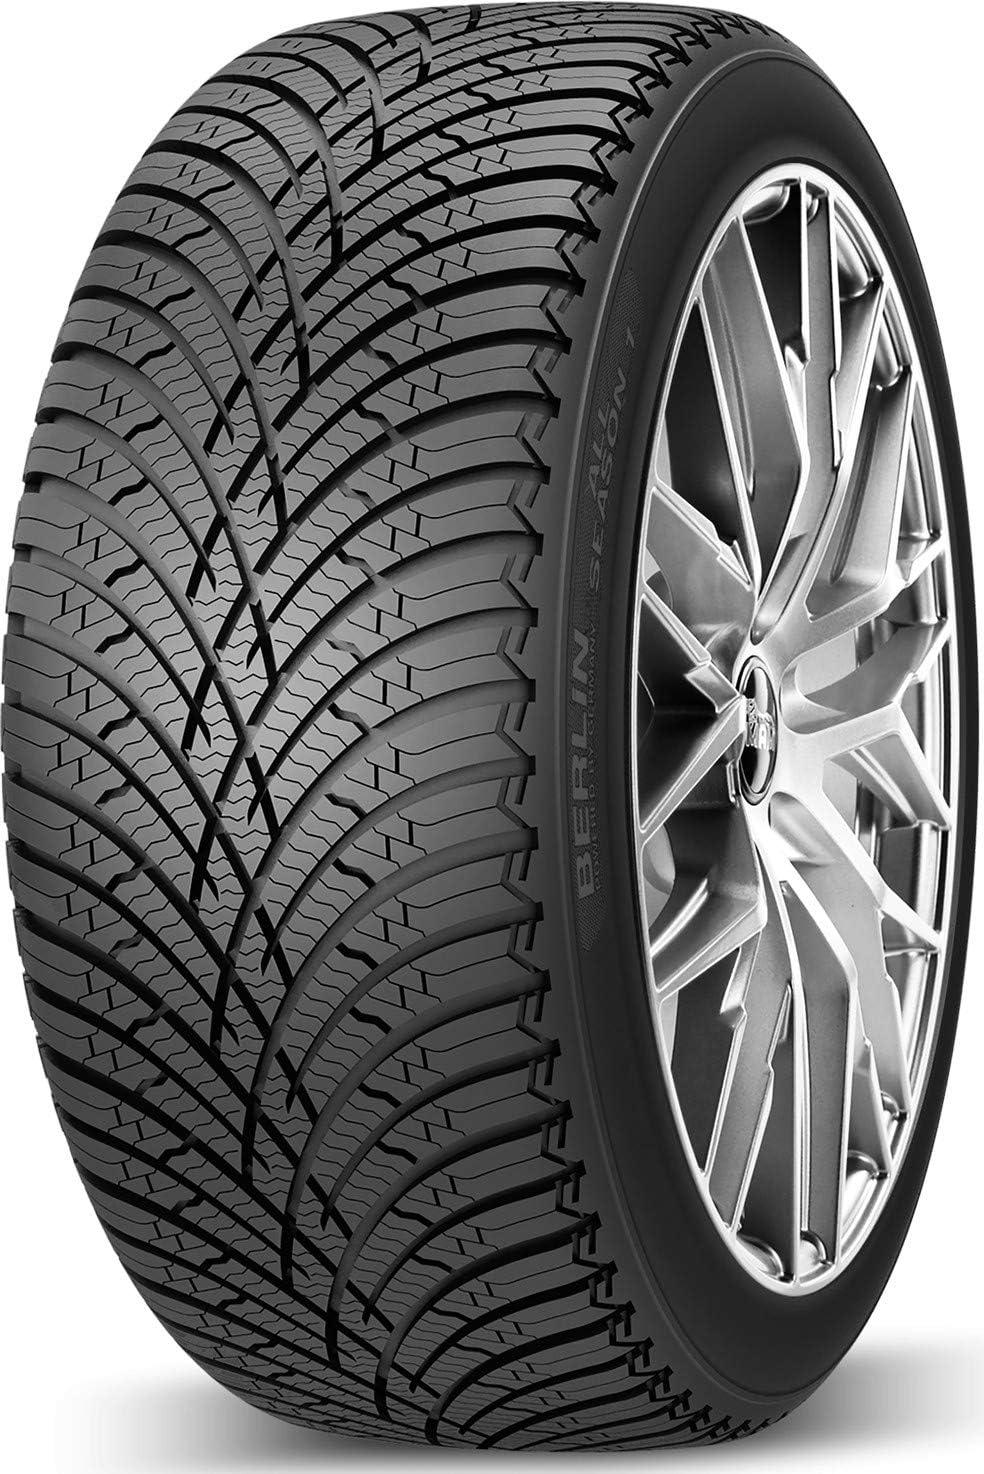 Berlin Tires All Season 1 Xl 205 50 17 93 V E B 73db Allwetter Pkw Auto